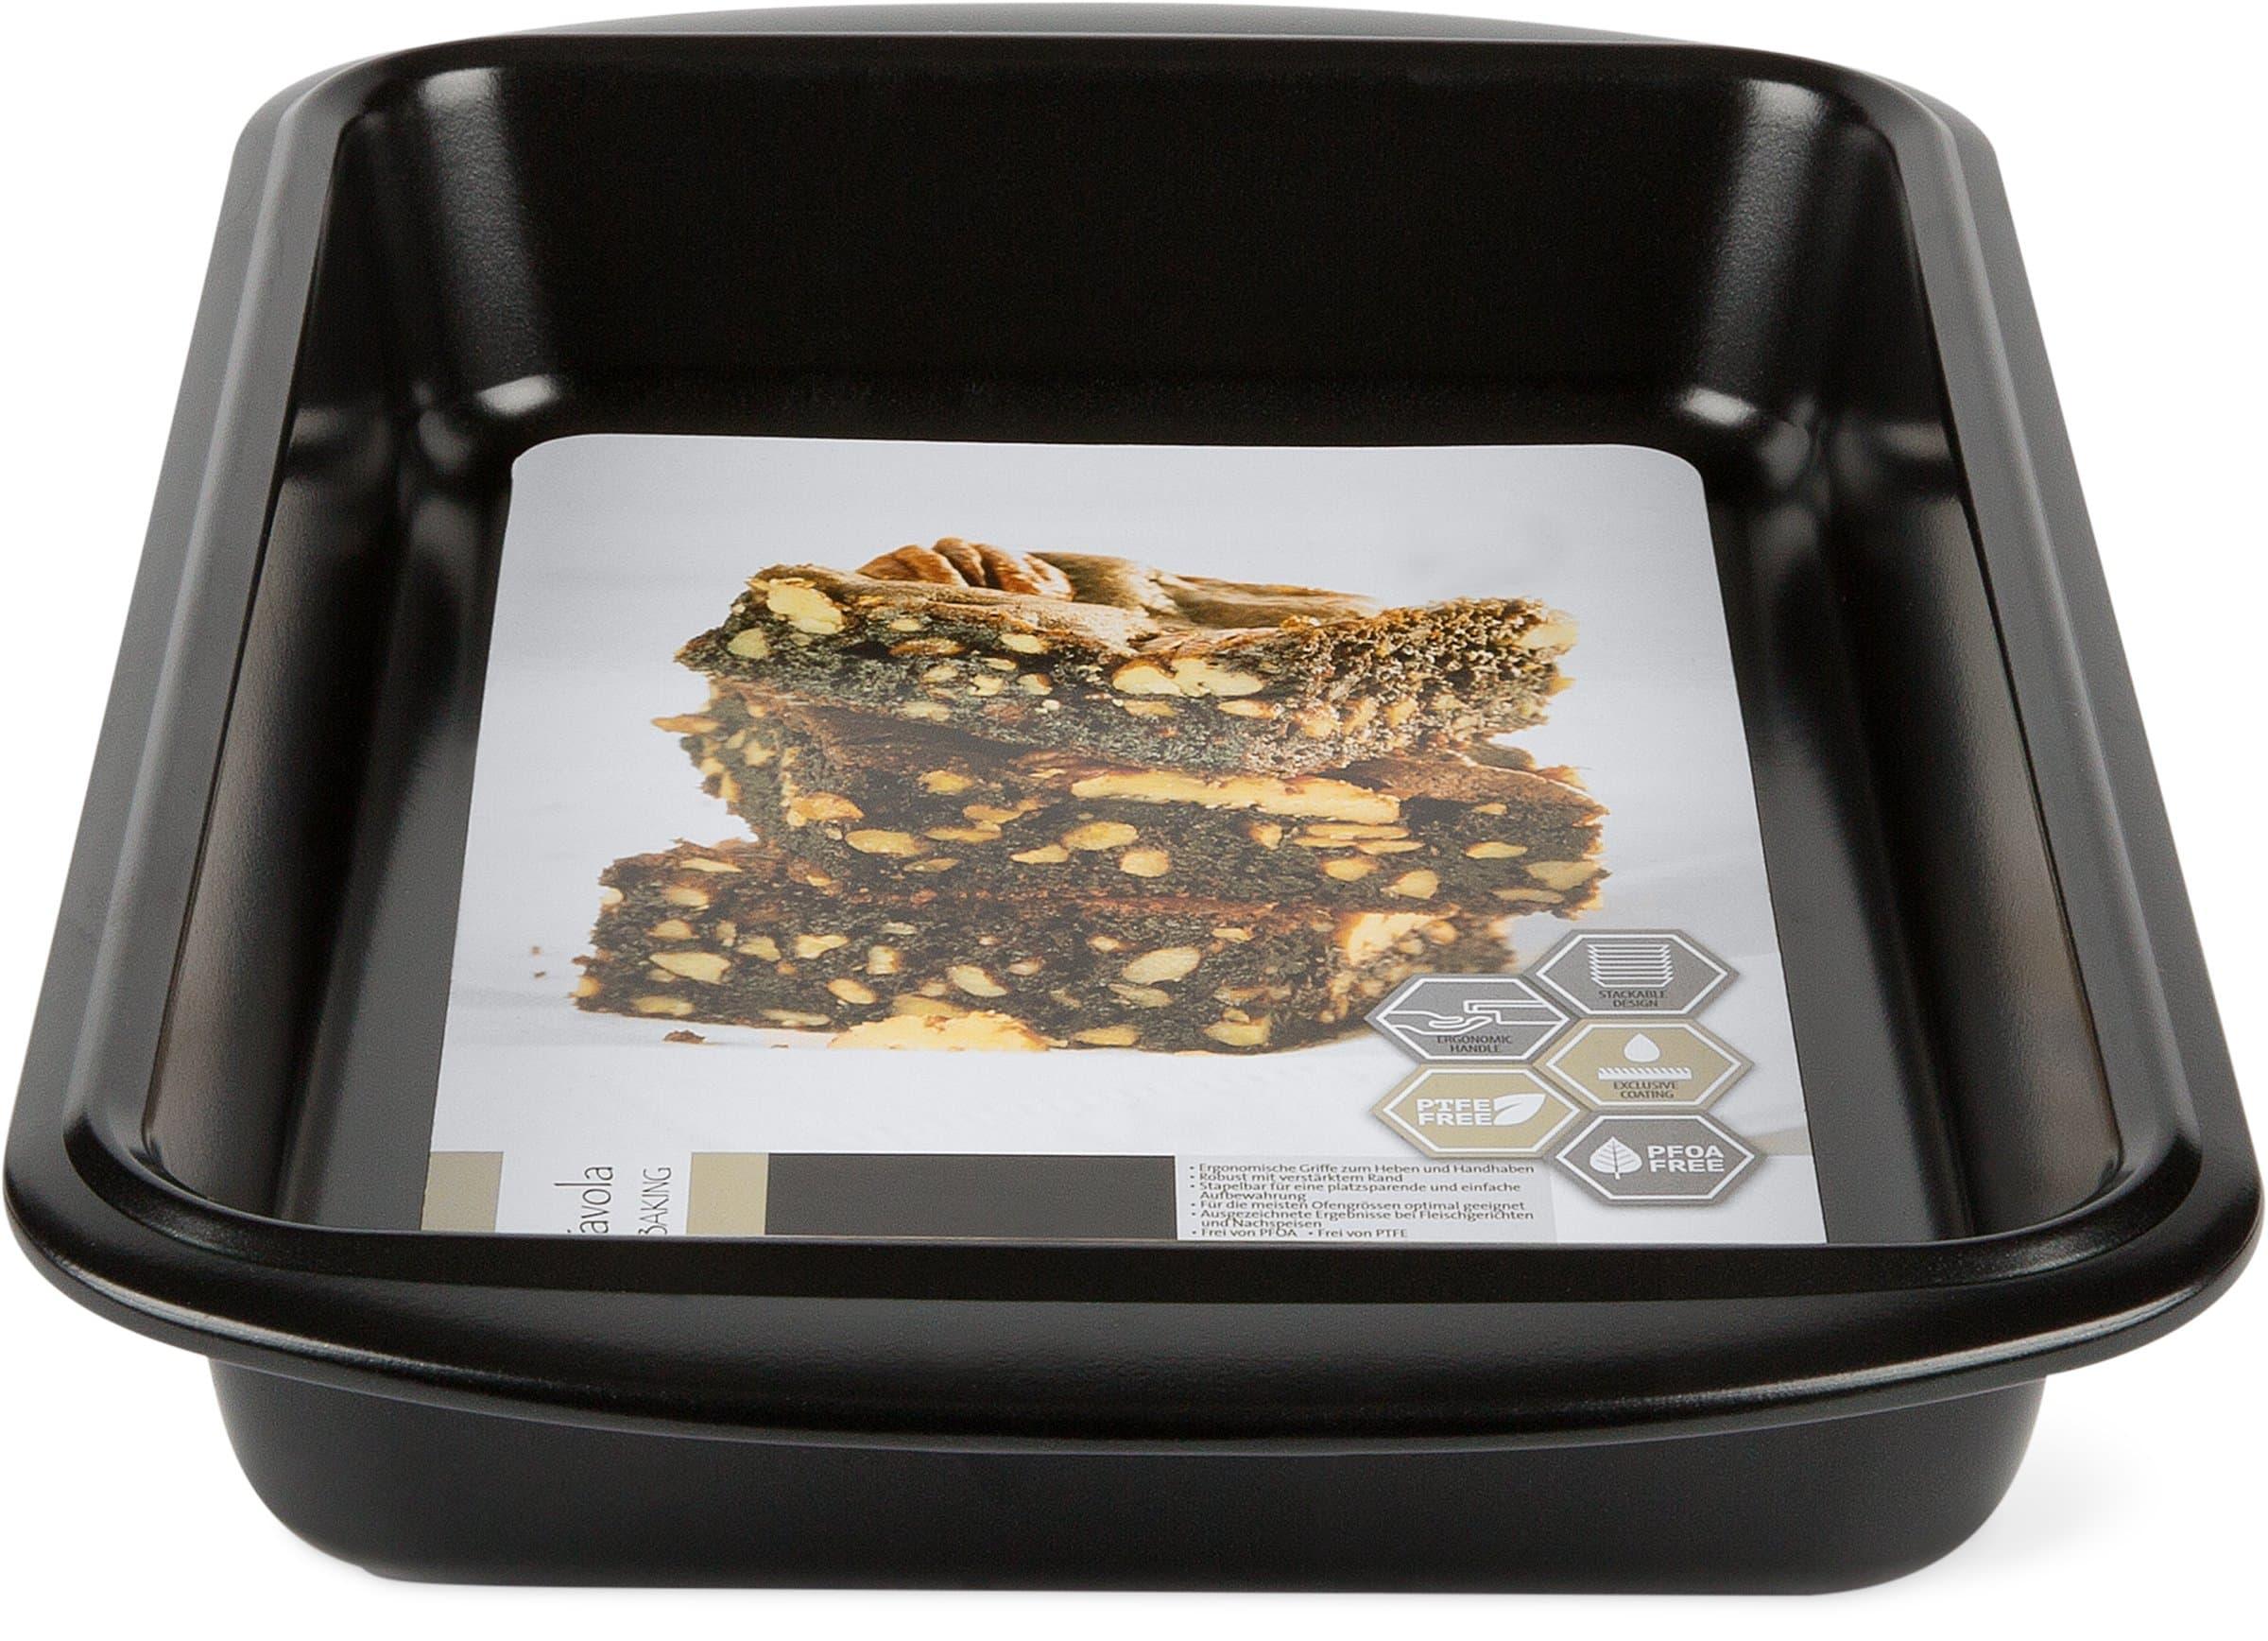 Cucina tavola stampo per brownies migros for Cucina tavola